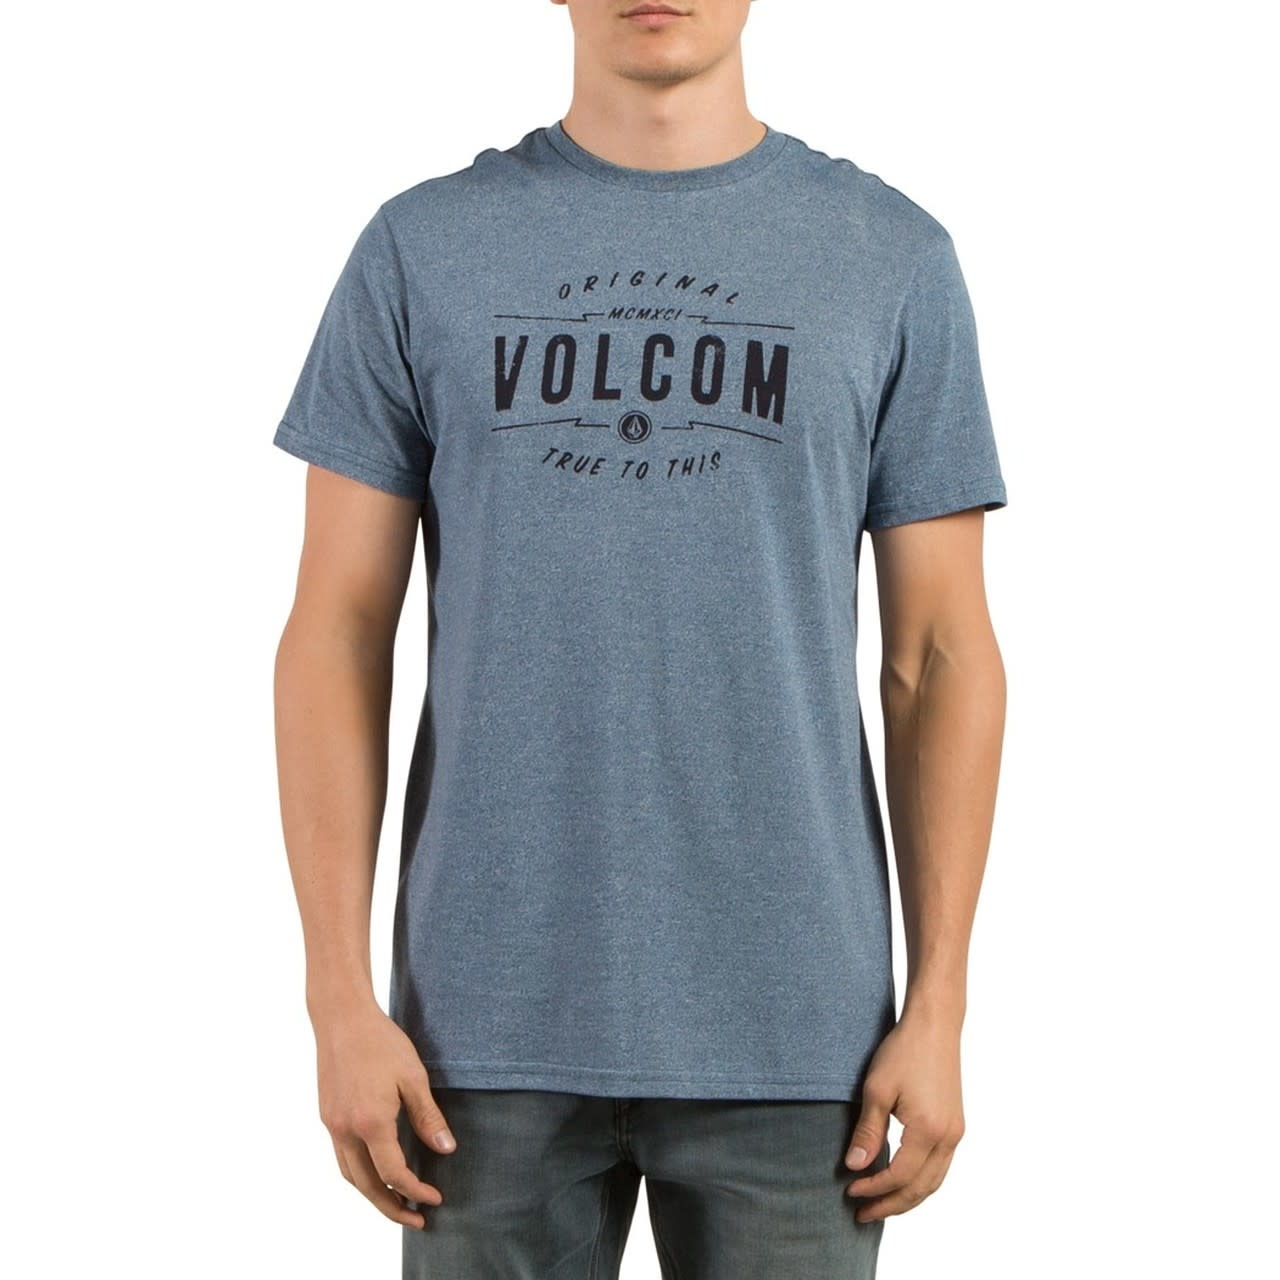 Volcom Garage Club Tee